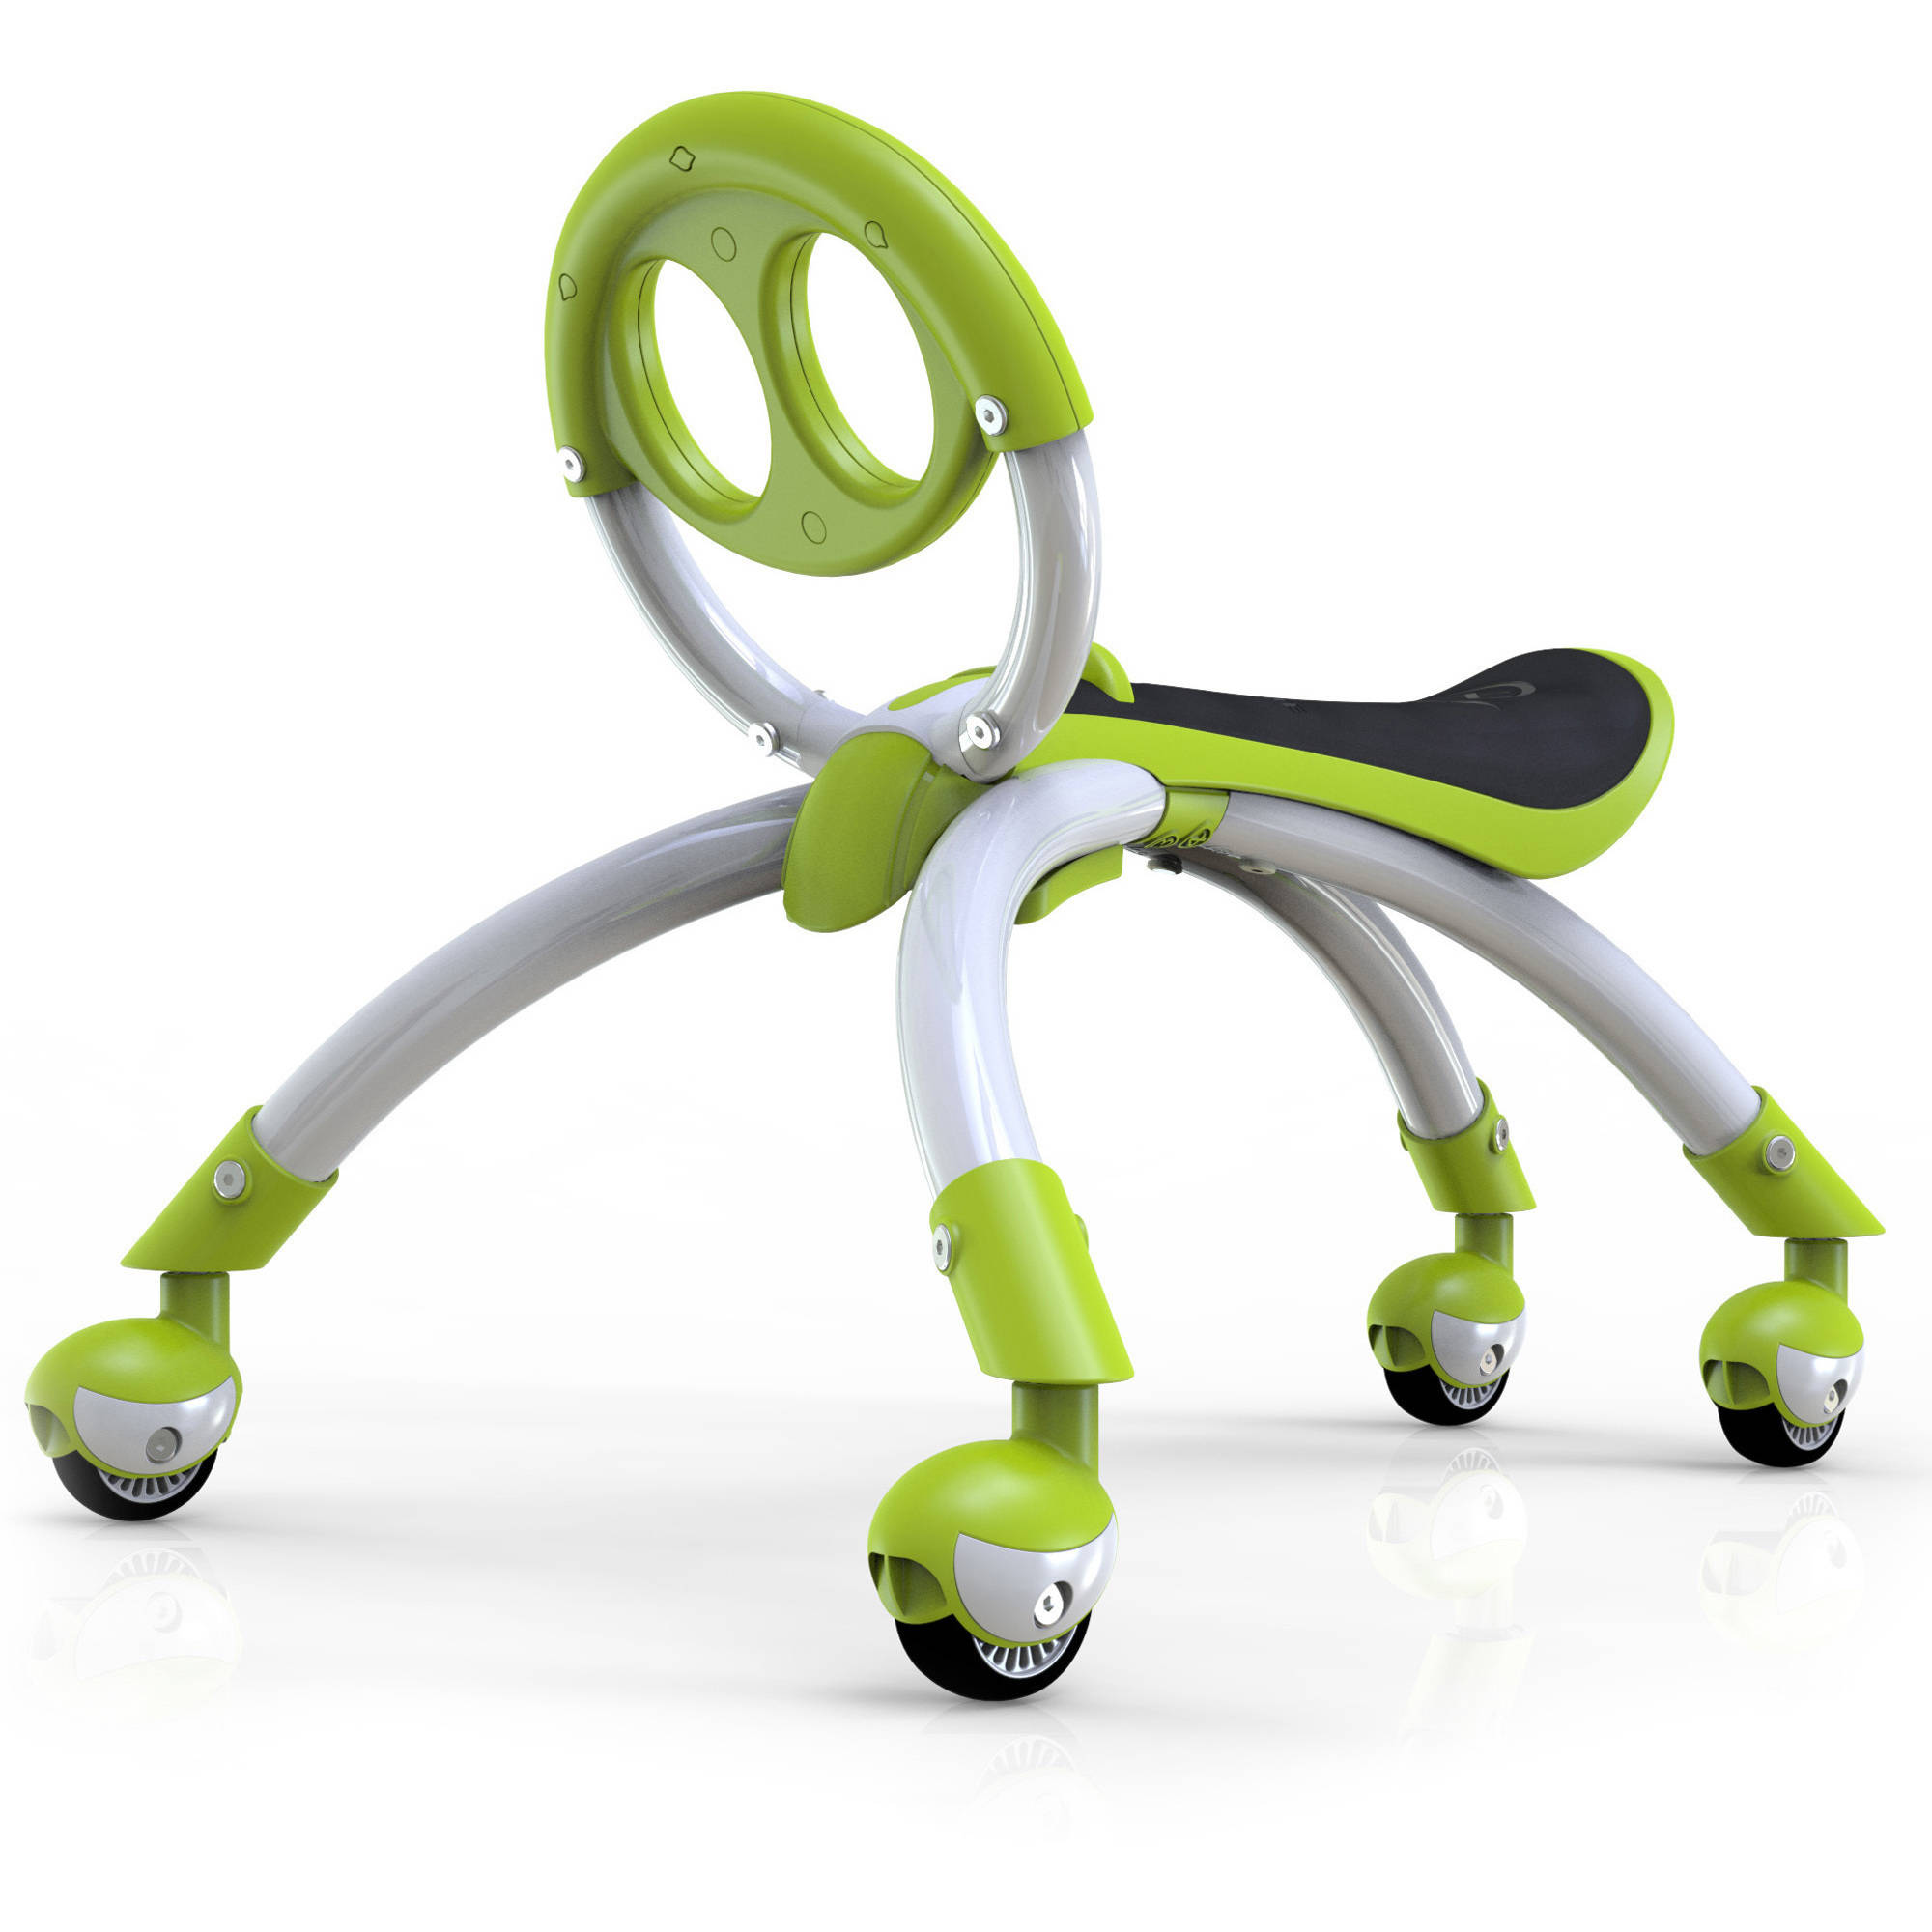 YBIKE Pewi Elite Todder Ride-On and Walking Buddy, Green